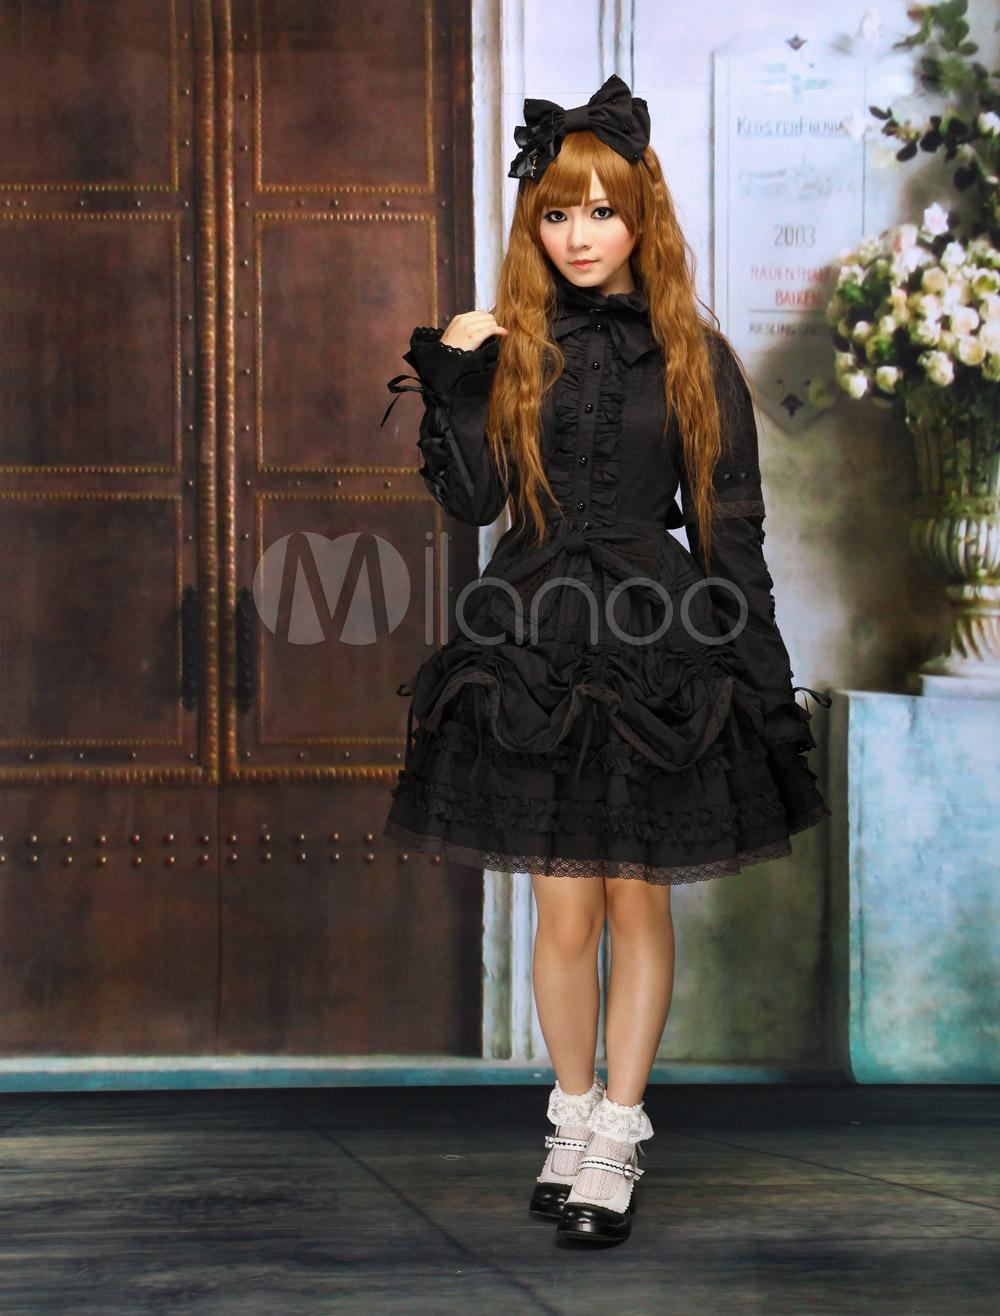 Milanoo ltd lolita onepiece black cotton long sleeves